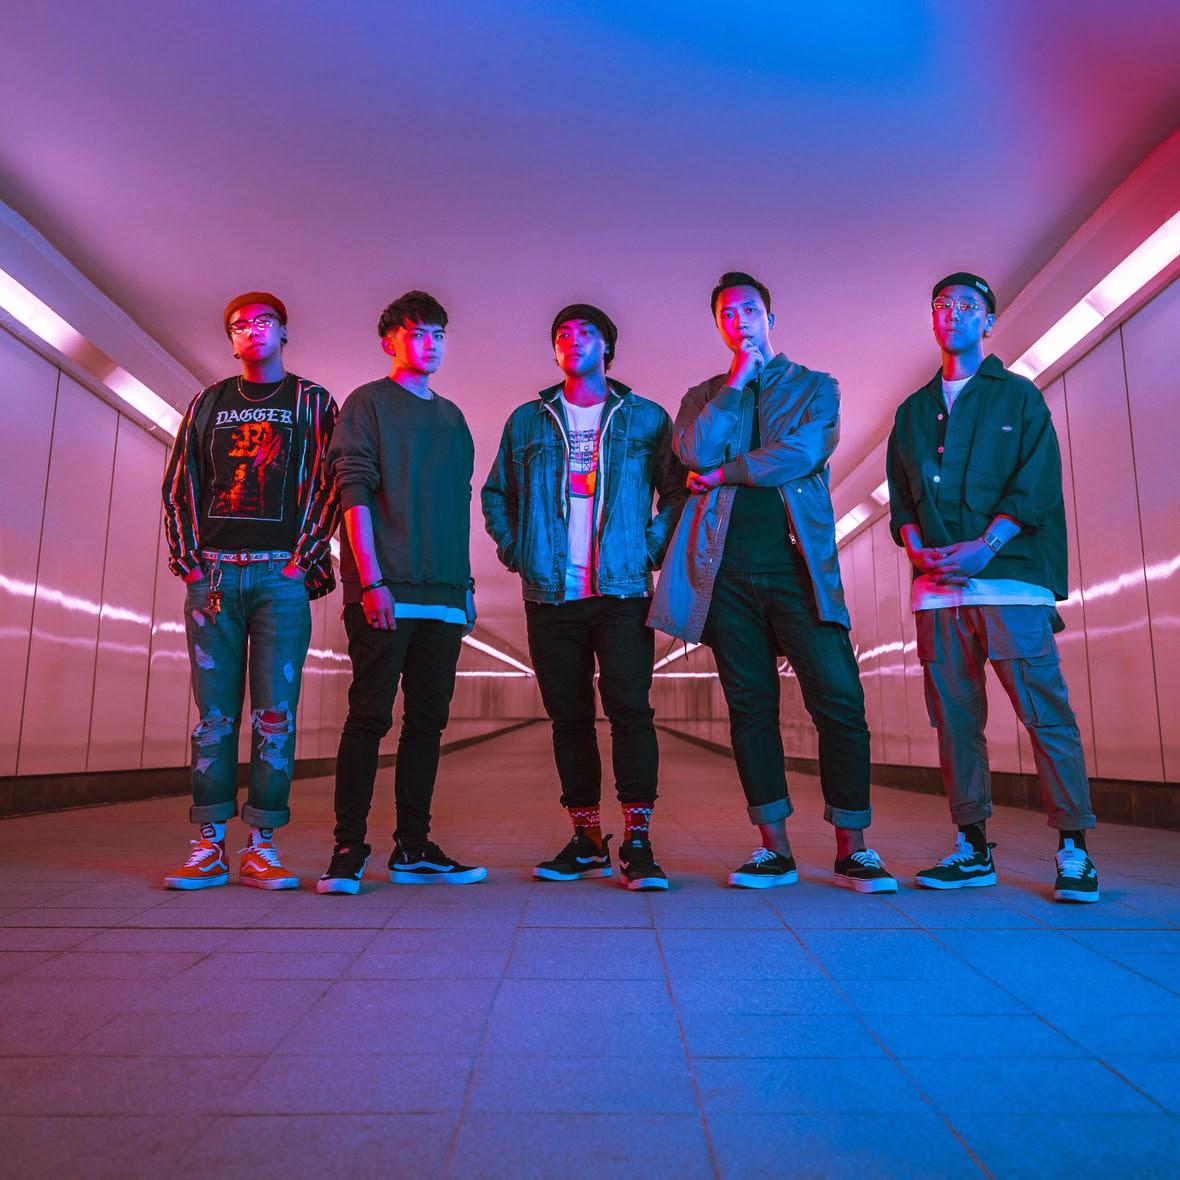 Seasons for Change are :  Kenta D. Mitsuhashi - Lead Vocal  Kulo Ming - Drums  Dennis Ho - Guitar/Backing Vocal  Wan Tsz Ching – Bass  Don Chan – Guitar